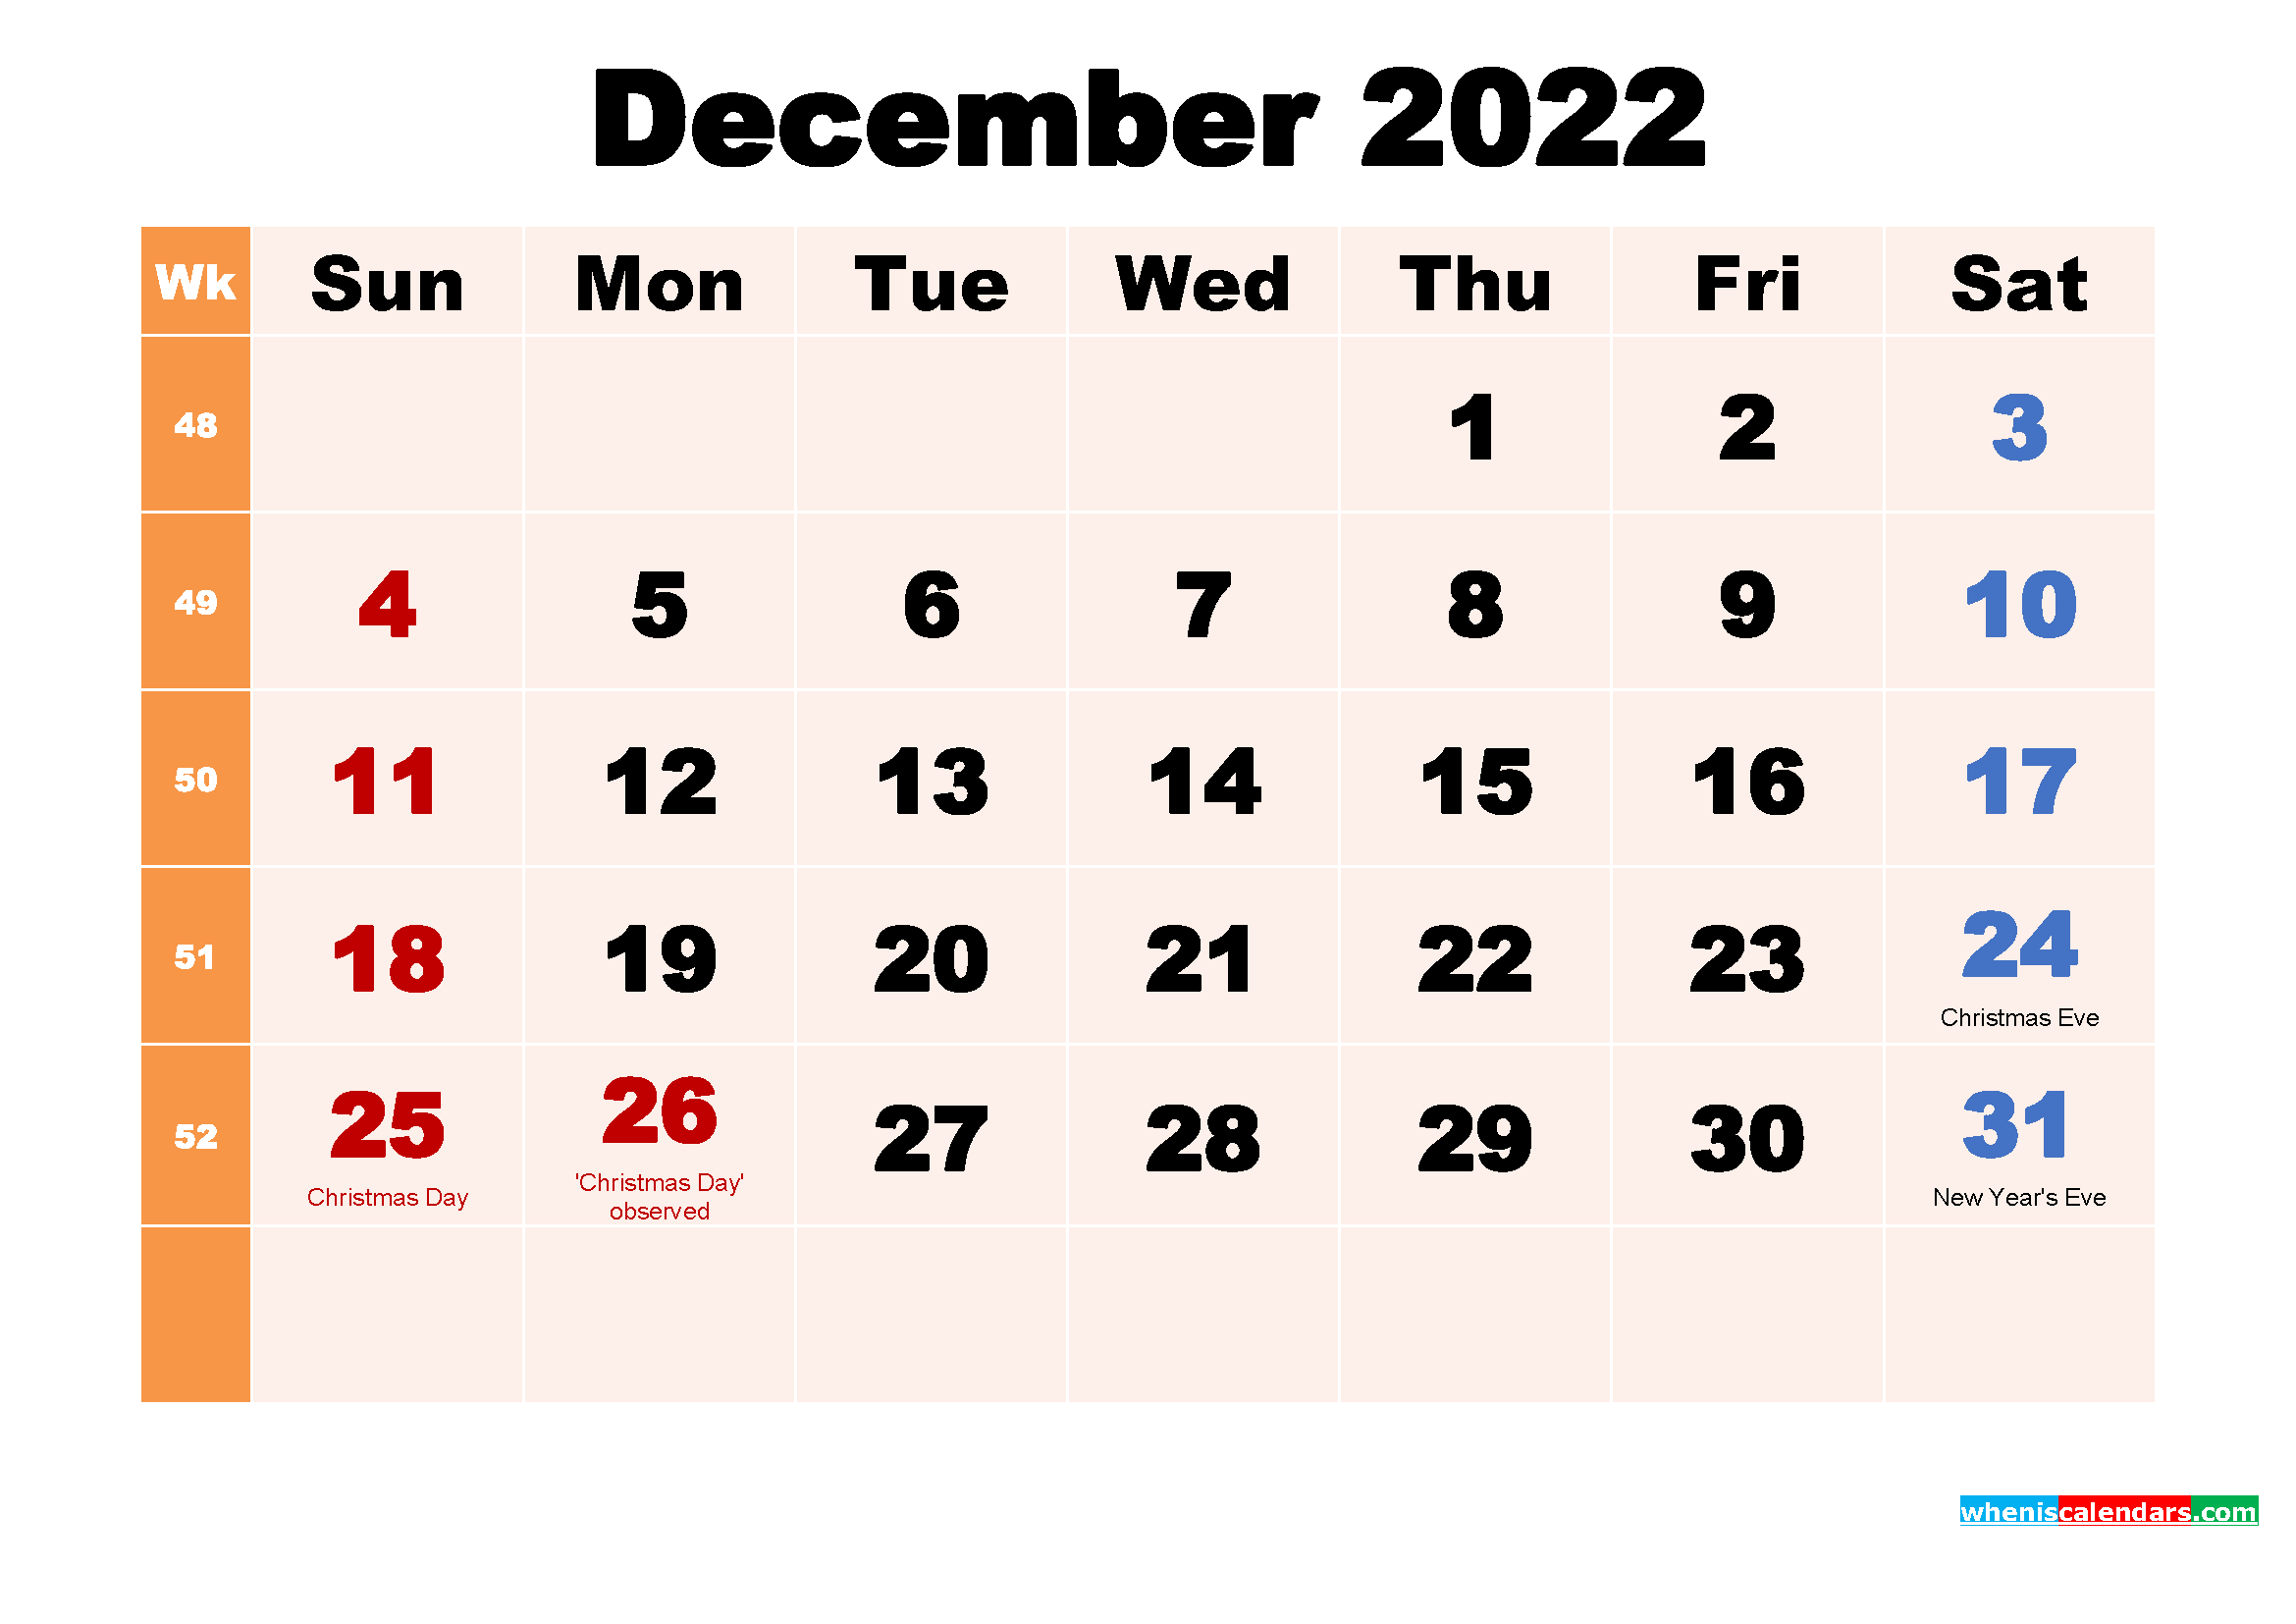 December 2022 Calendar Wallpaper Free Download